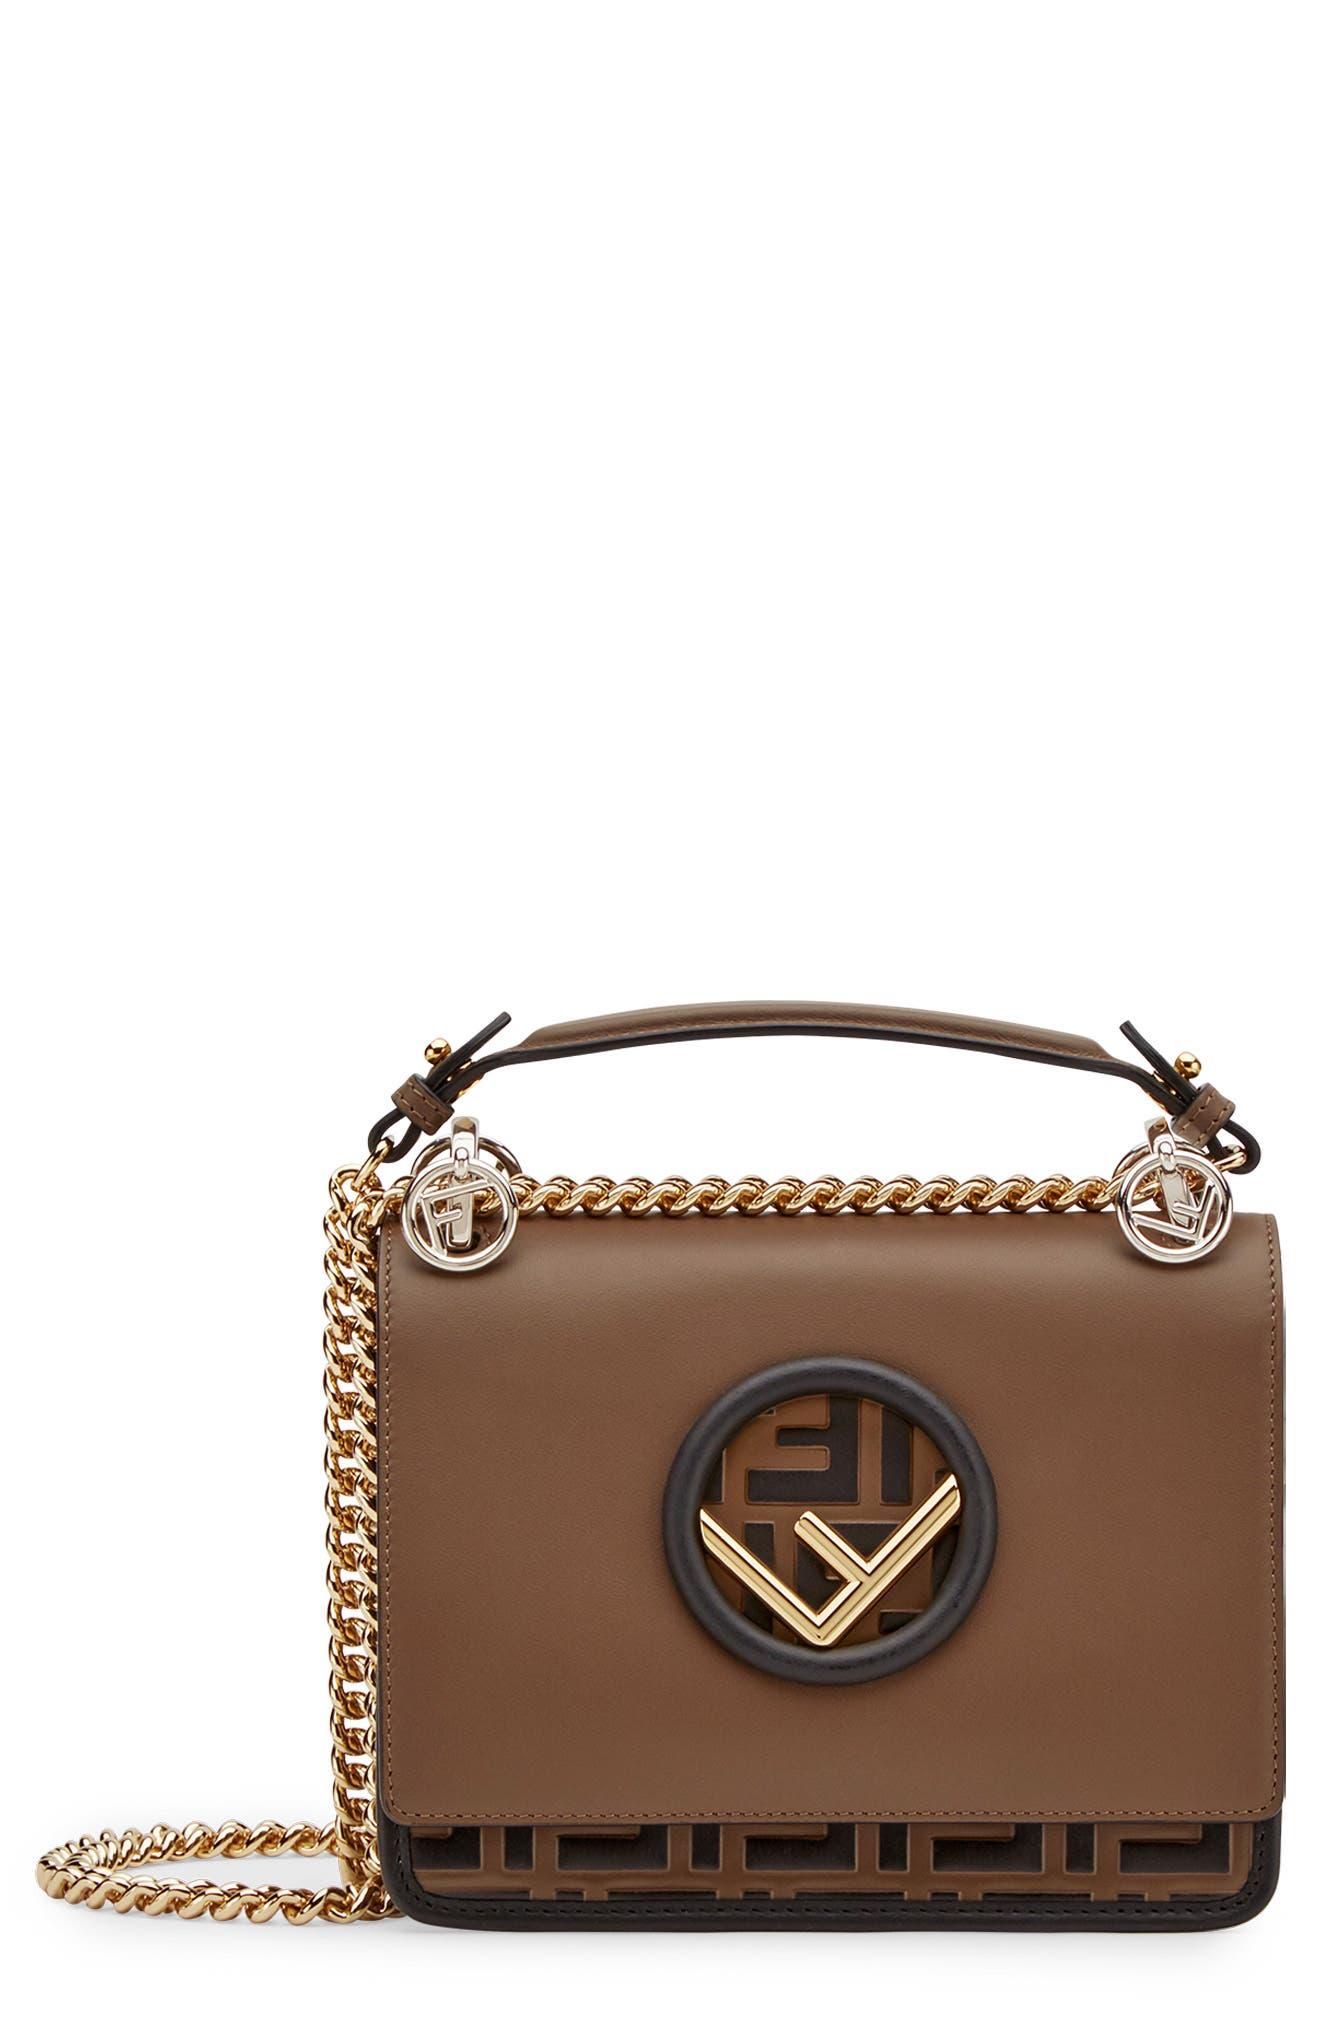 FENDI,                             Small Kan I Logo Embossed Leather Shoulder Bag,                             Main thumbnail 1, color,                             MAYA/ NERO